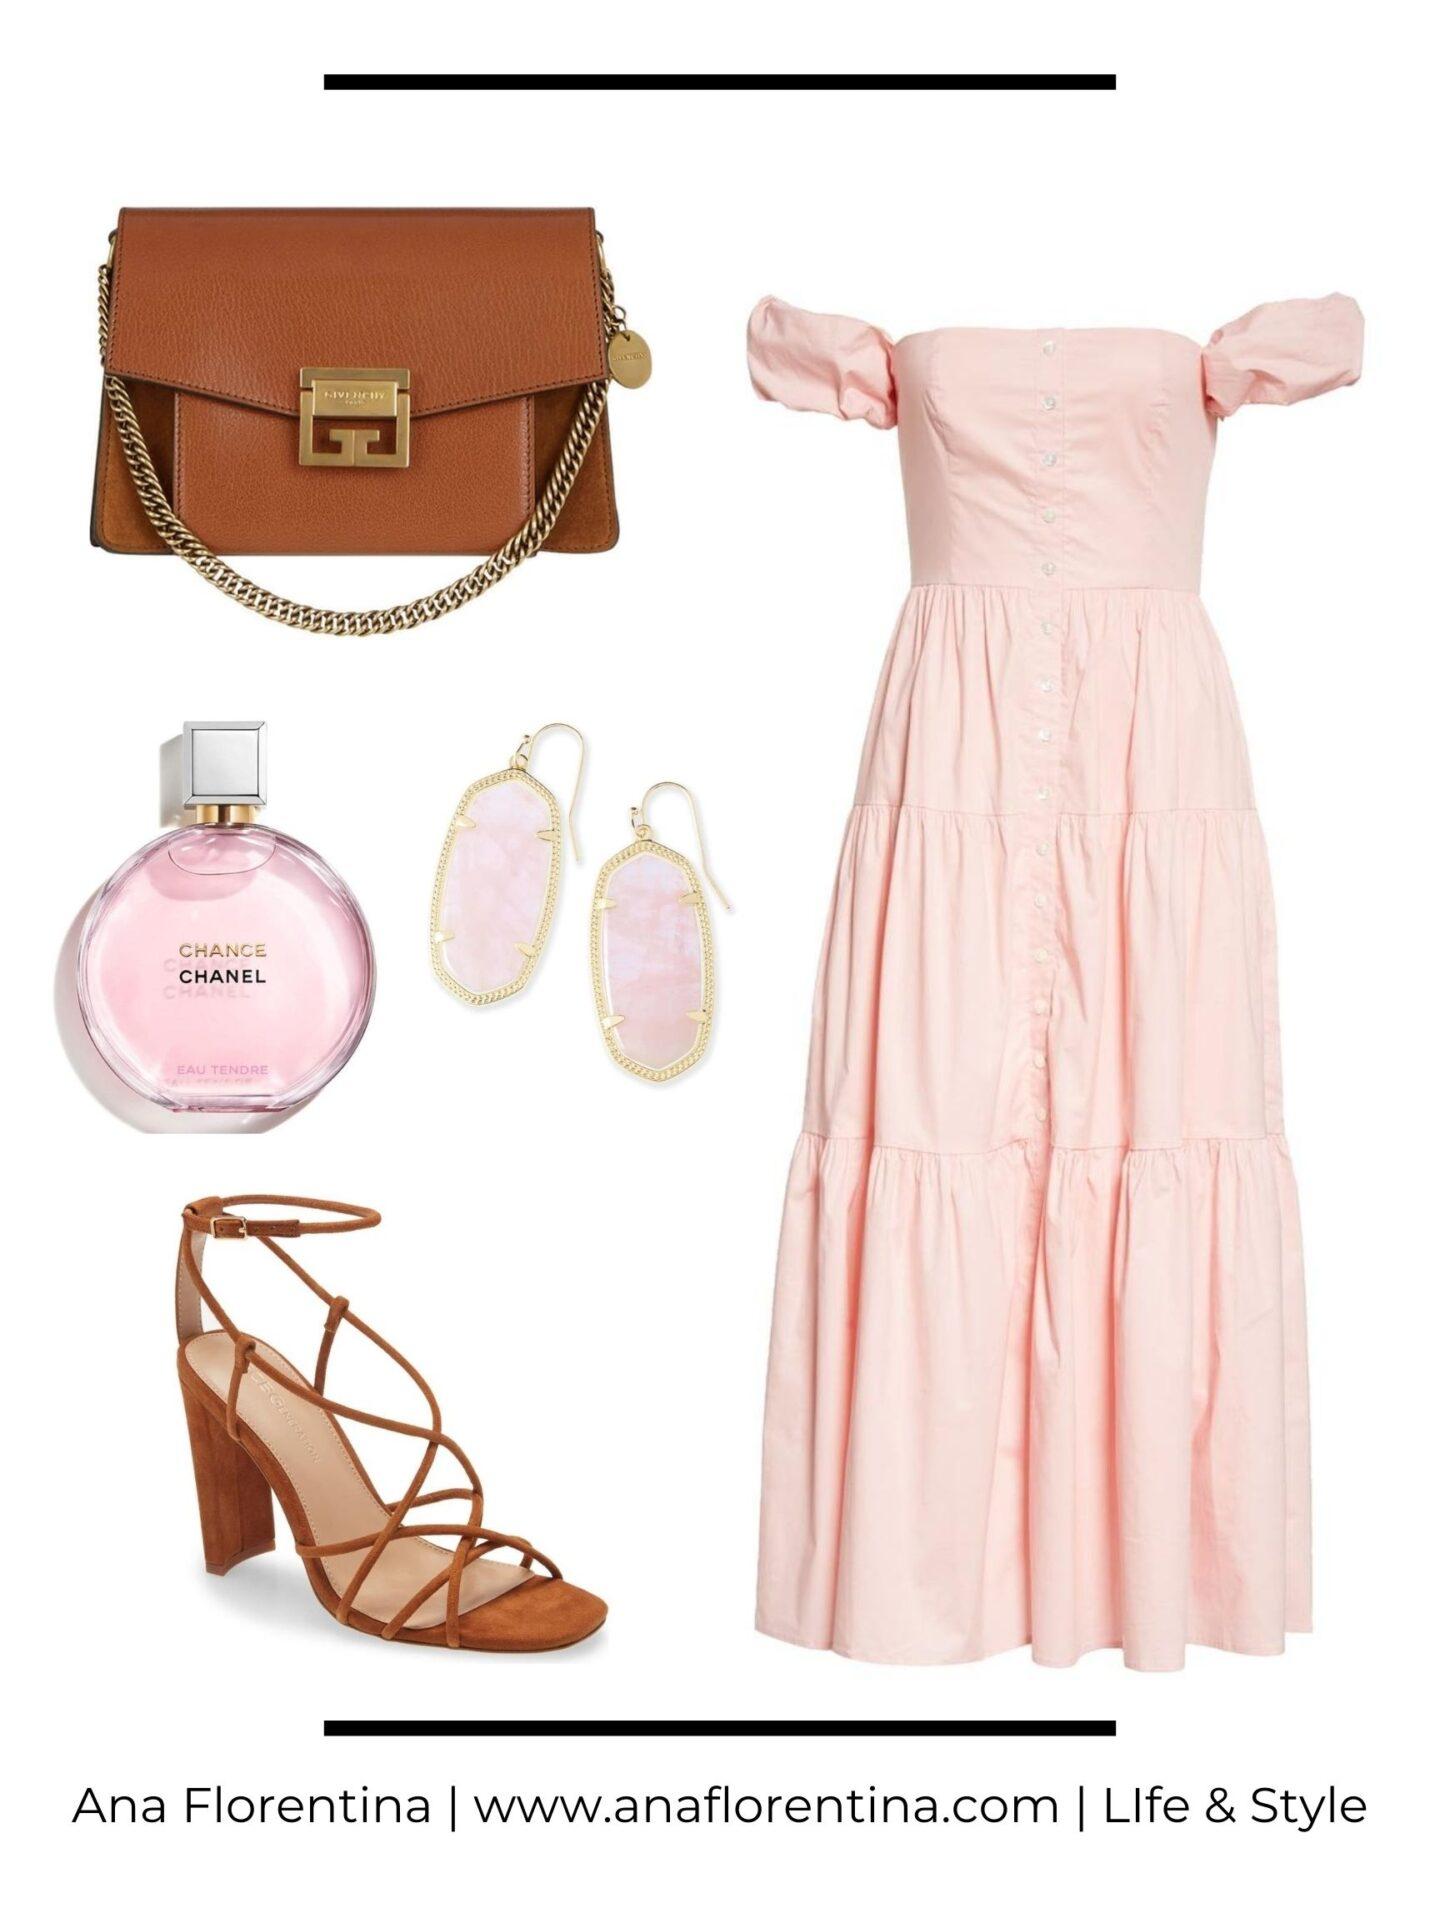 Shop-the-look-staud-dress